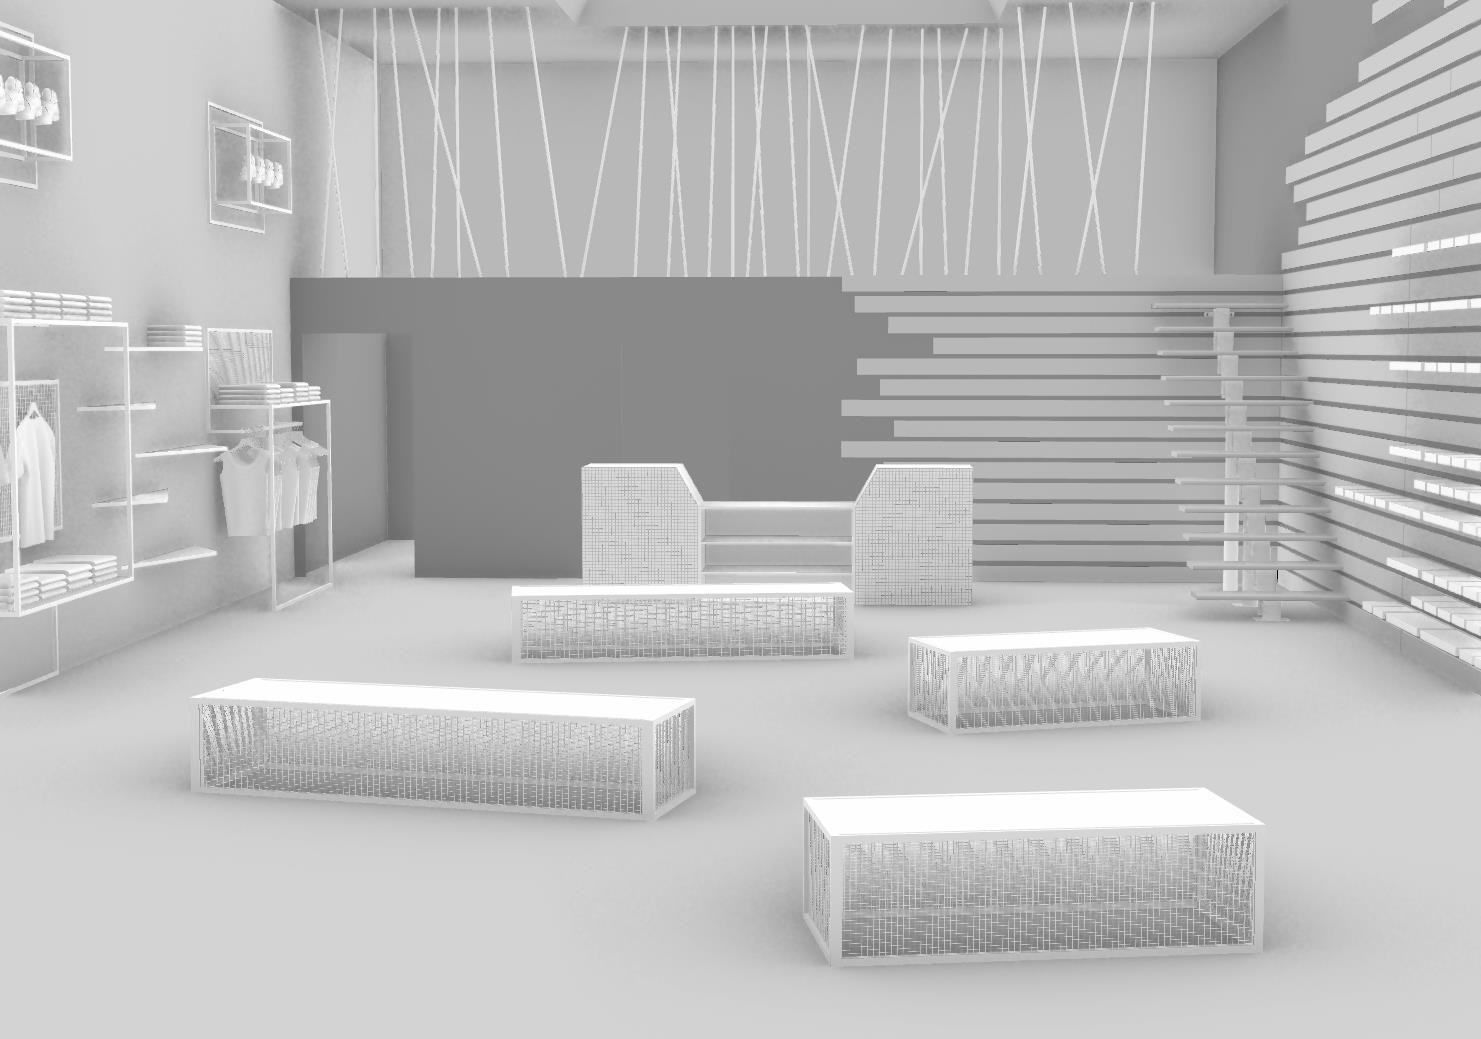 Concept Render